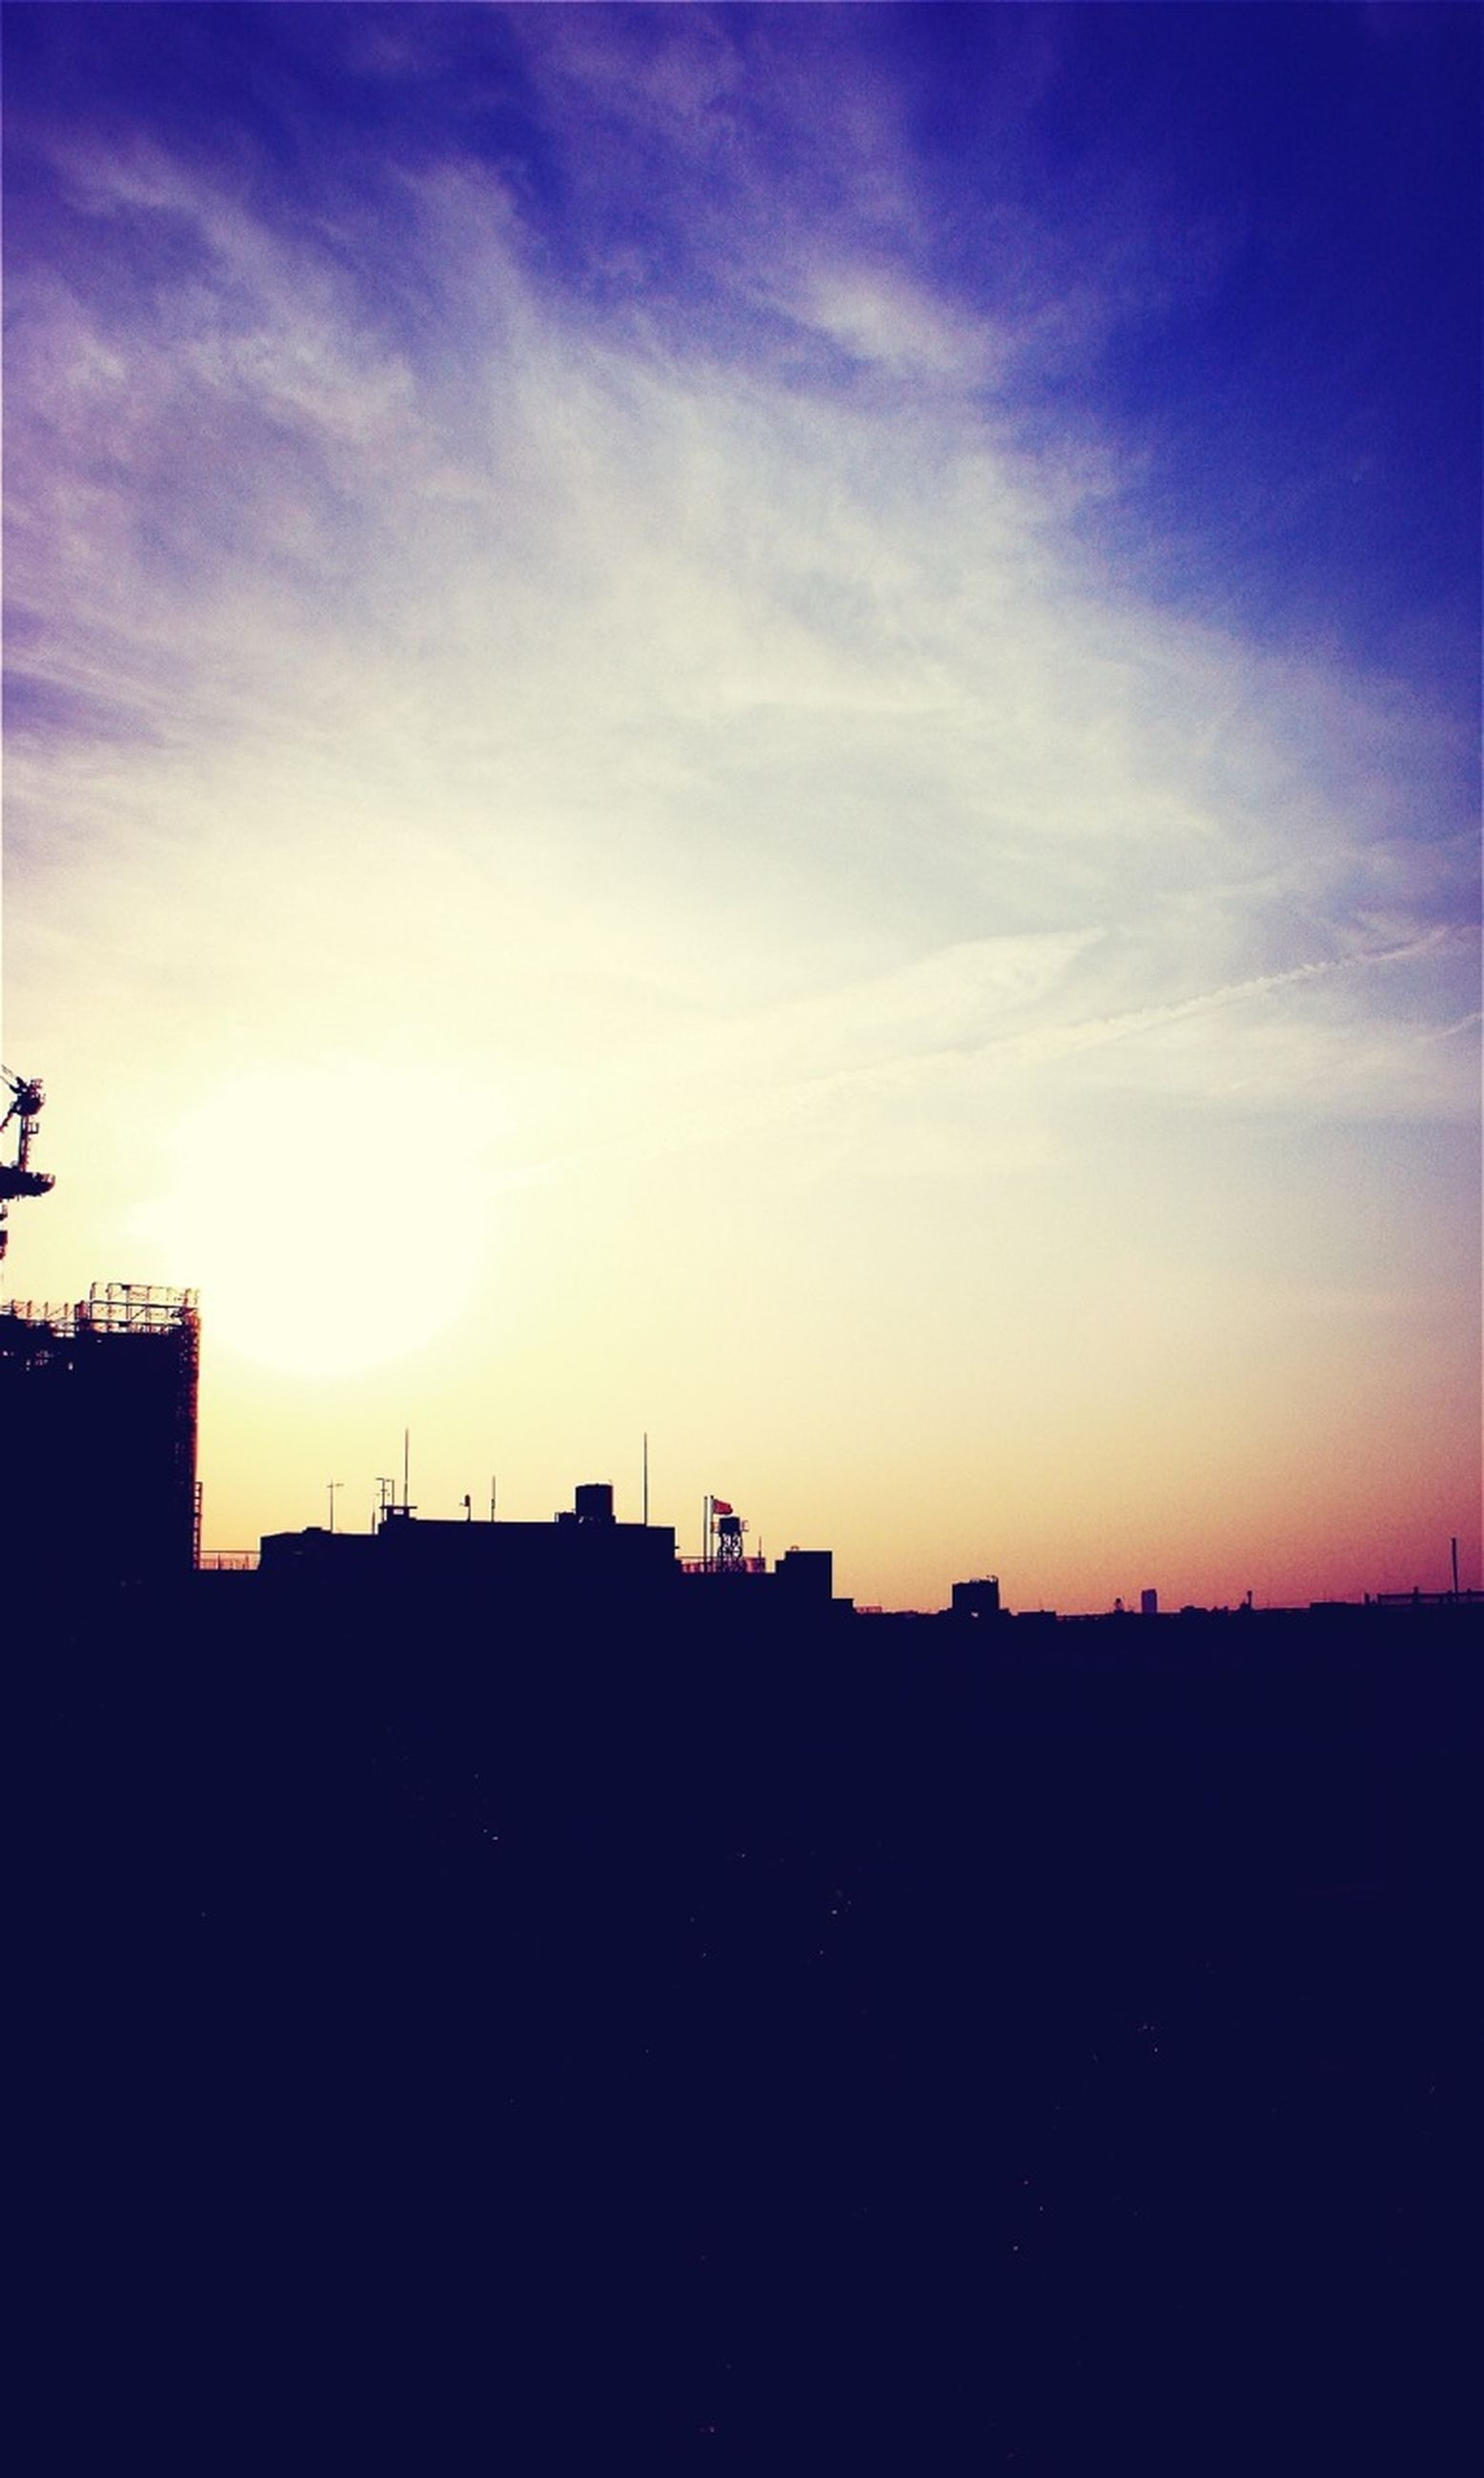 sunset, silhouette, building exterior, built structure, architecture, sky, copy space, scenics, beauty in nature, orange color, blue, city, sunlight, dark, outline, nature, cloud - sky, sun, outdoors, cloud